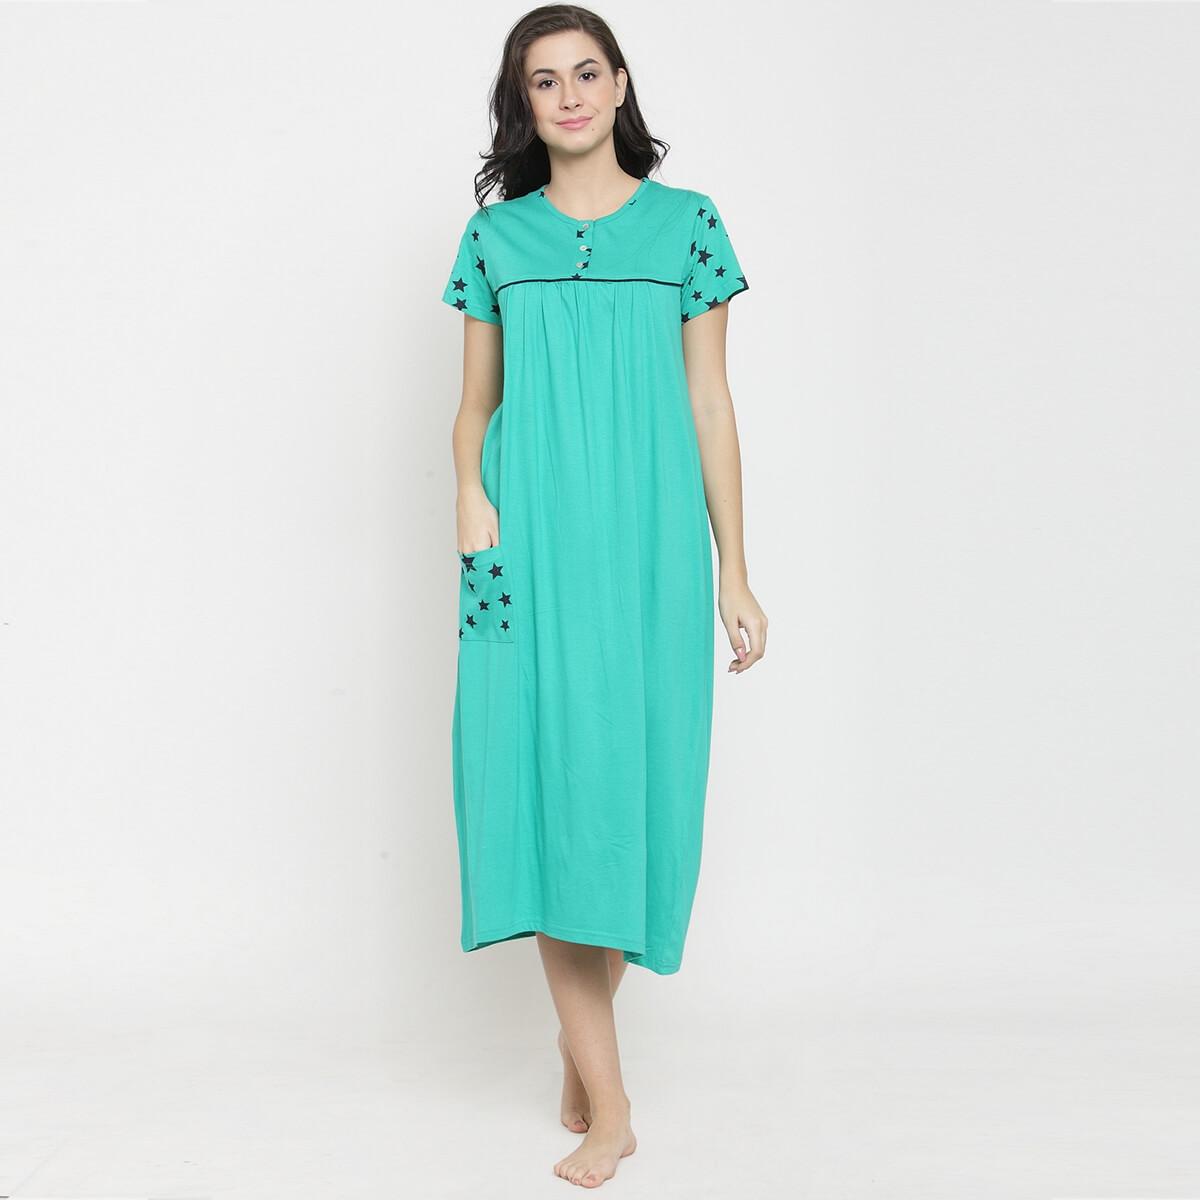 Arcadia Star Night Dress